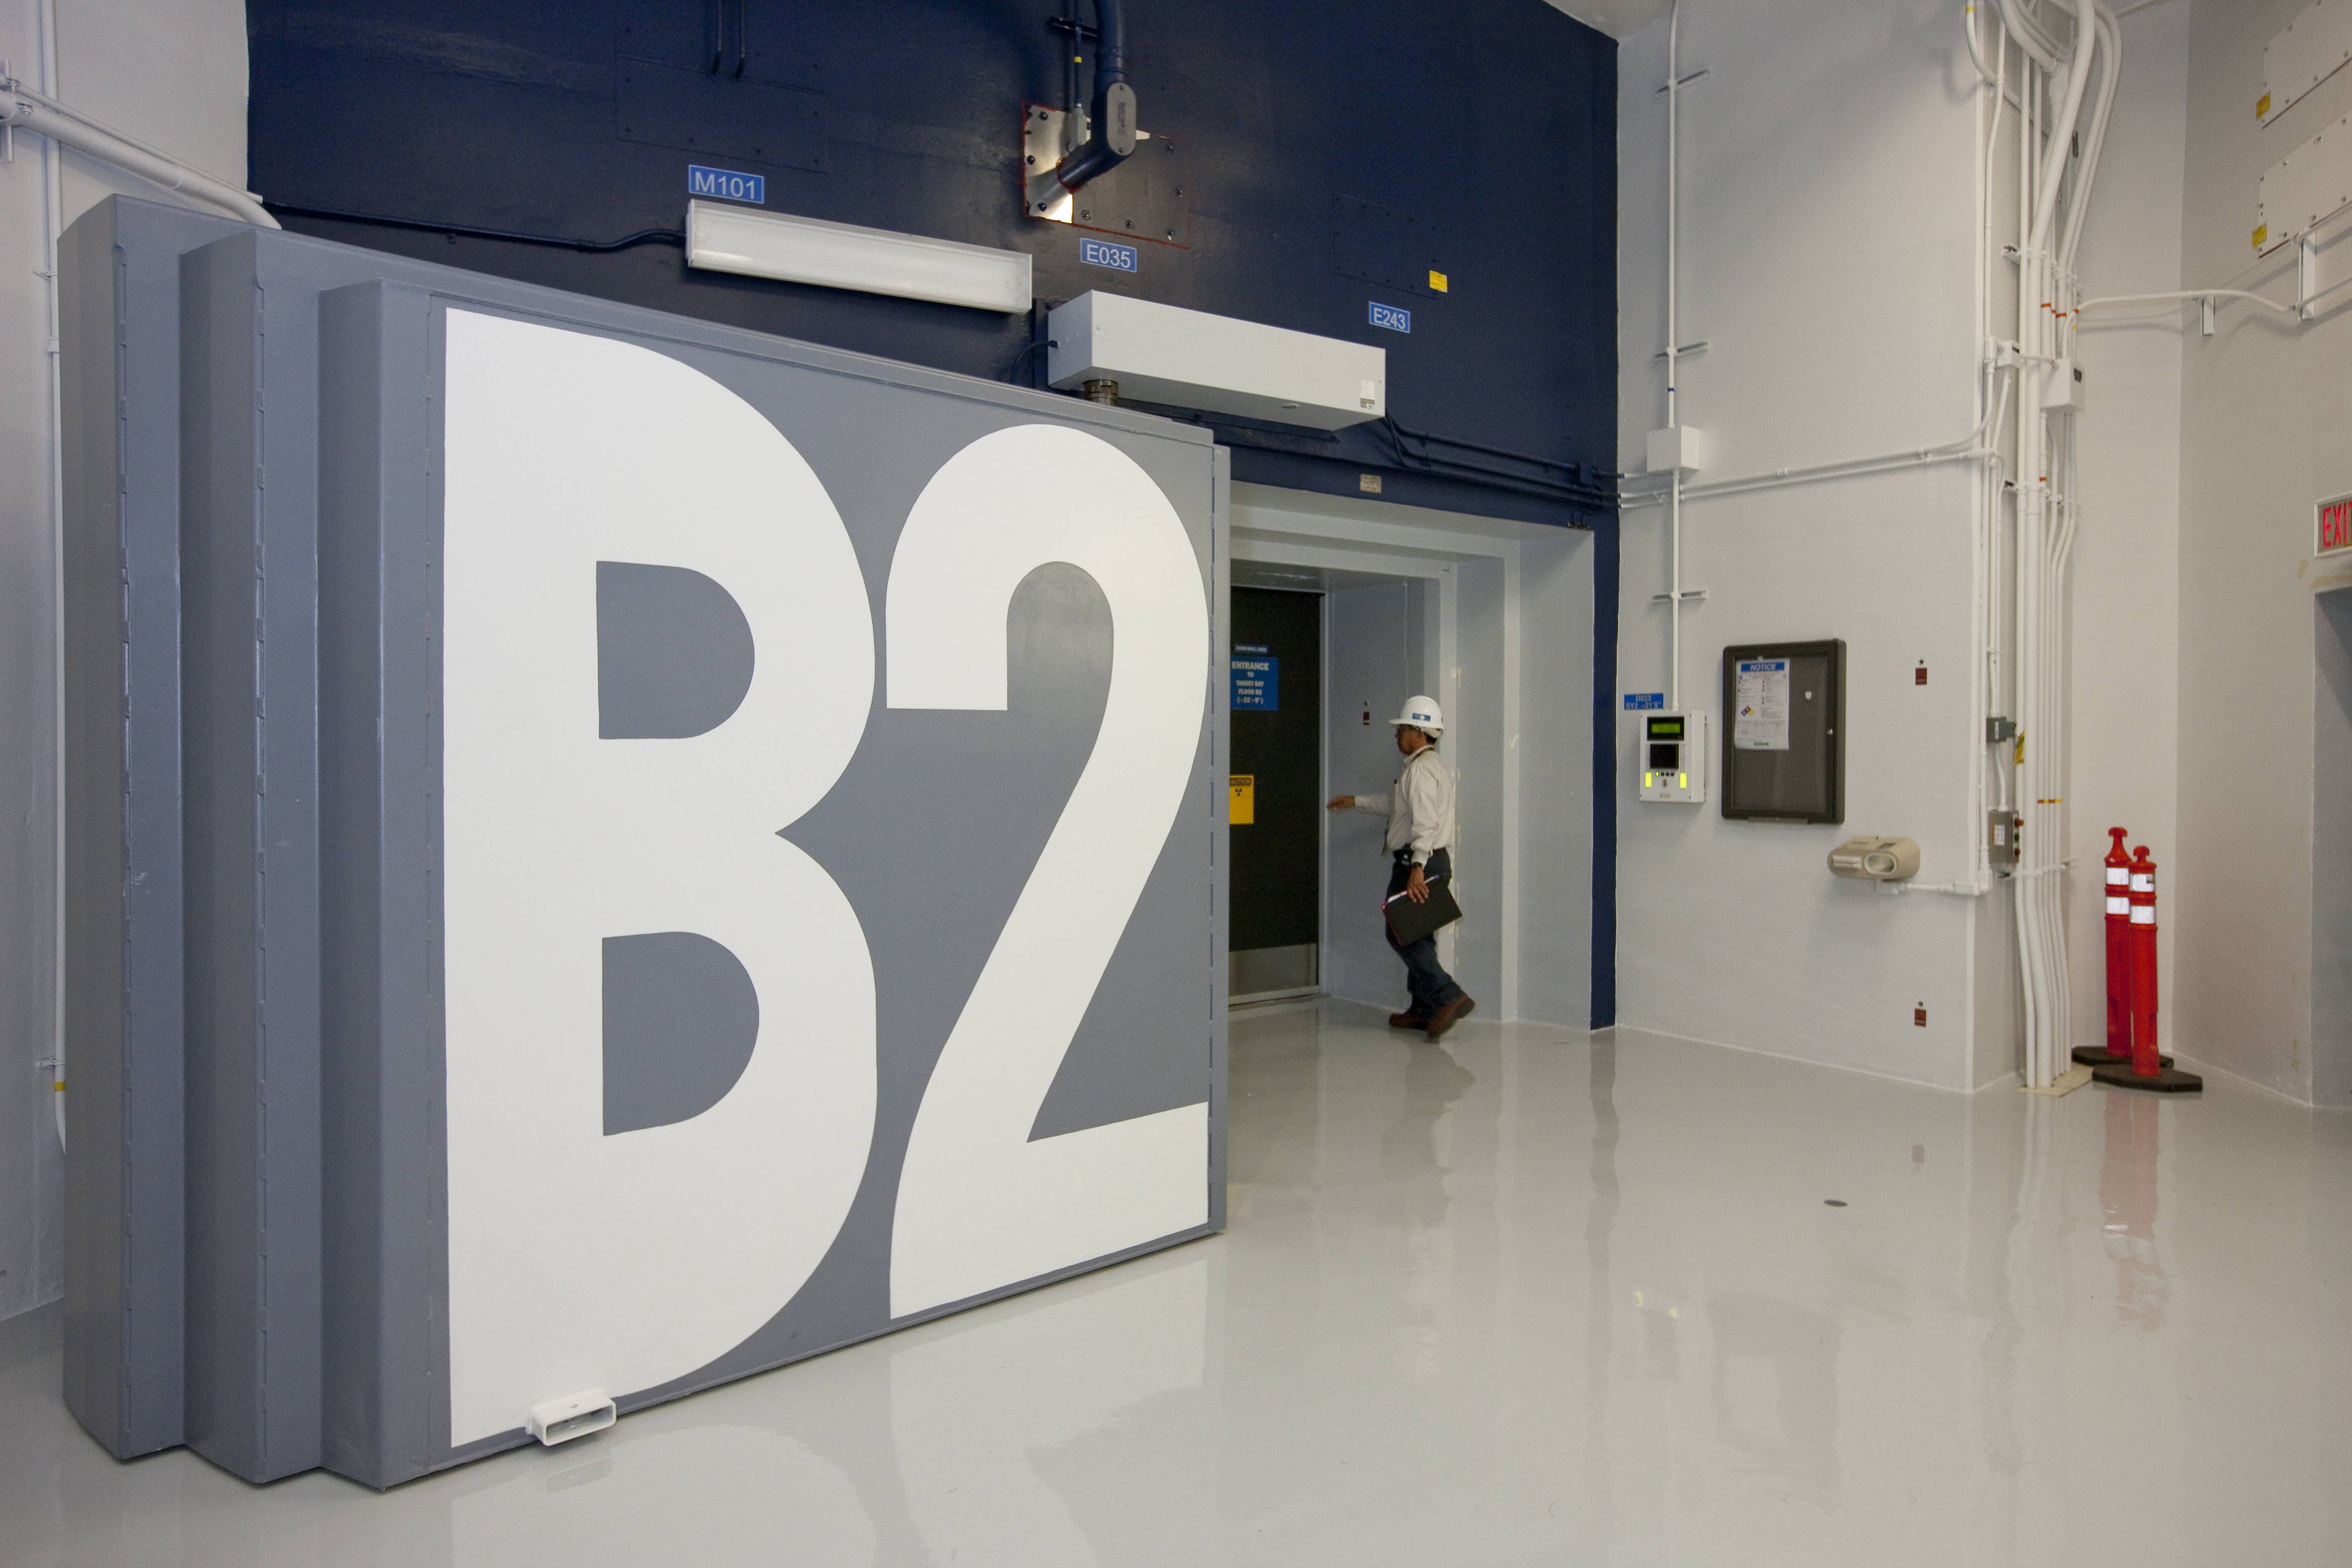 Radiation Shielded Doors